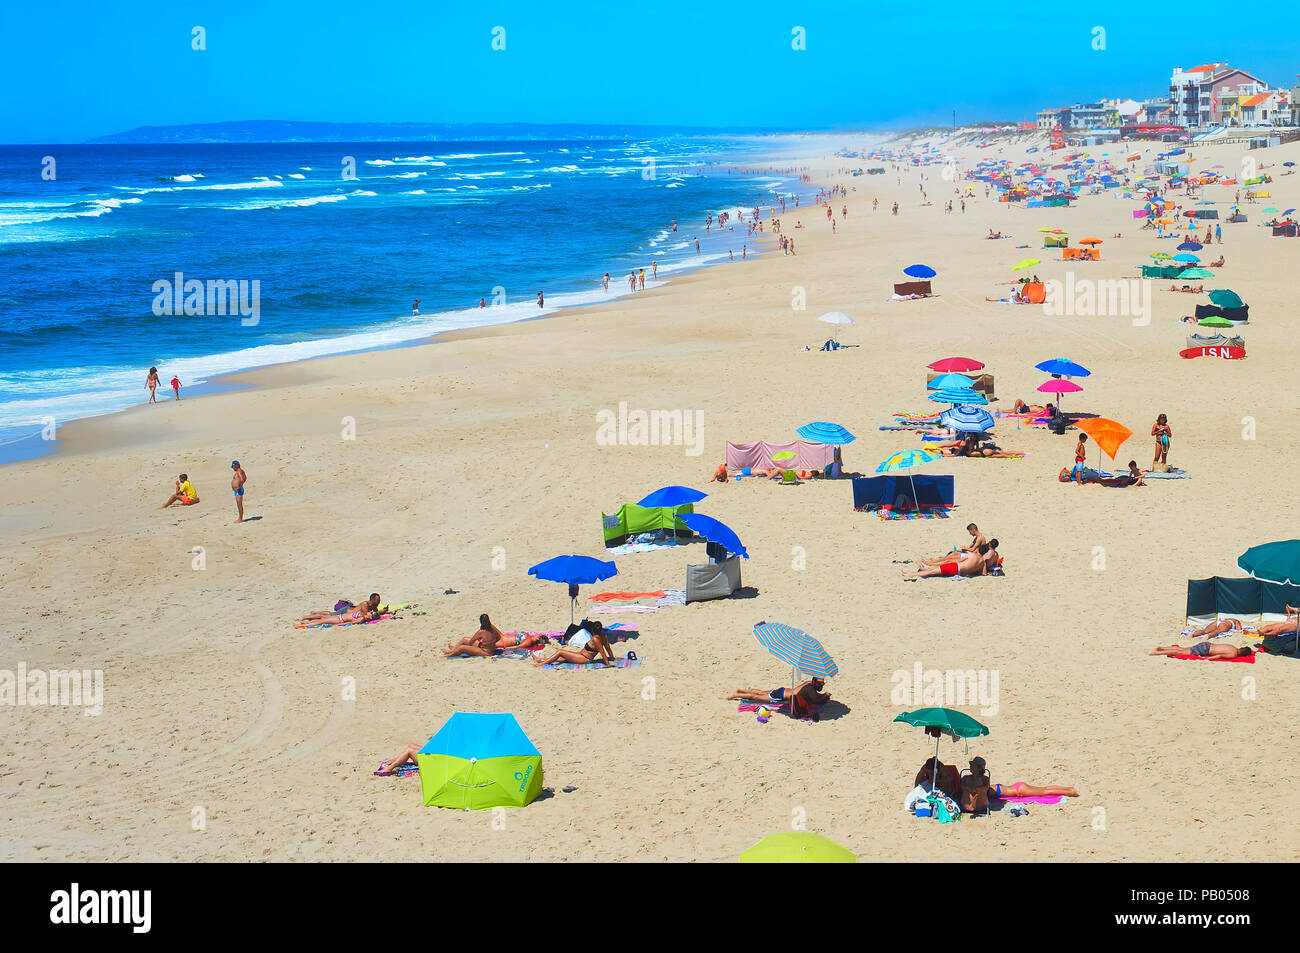 ESPINHO, PORTUGAL - JUL 30, 2017: People sunbathe at the ocean beach. Portugal famous tourist destination for it's ocean beaches. - Stock Image